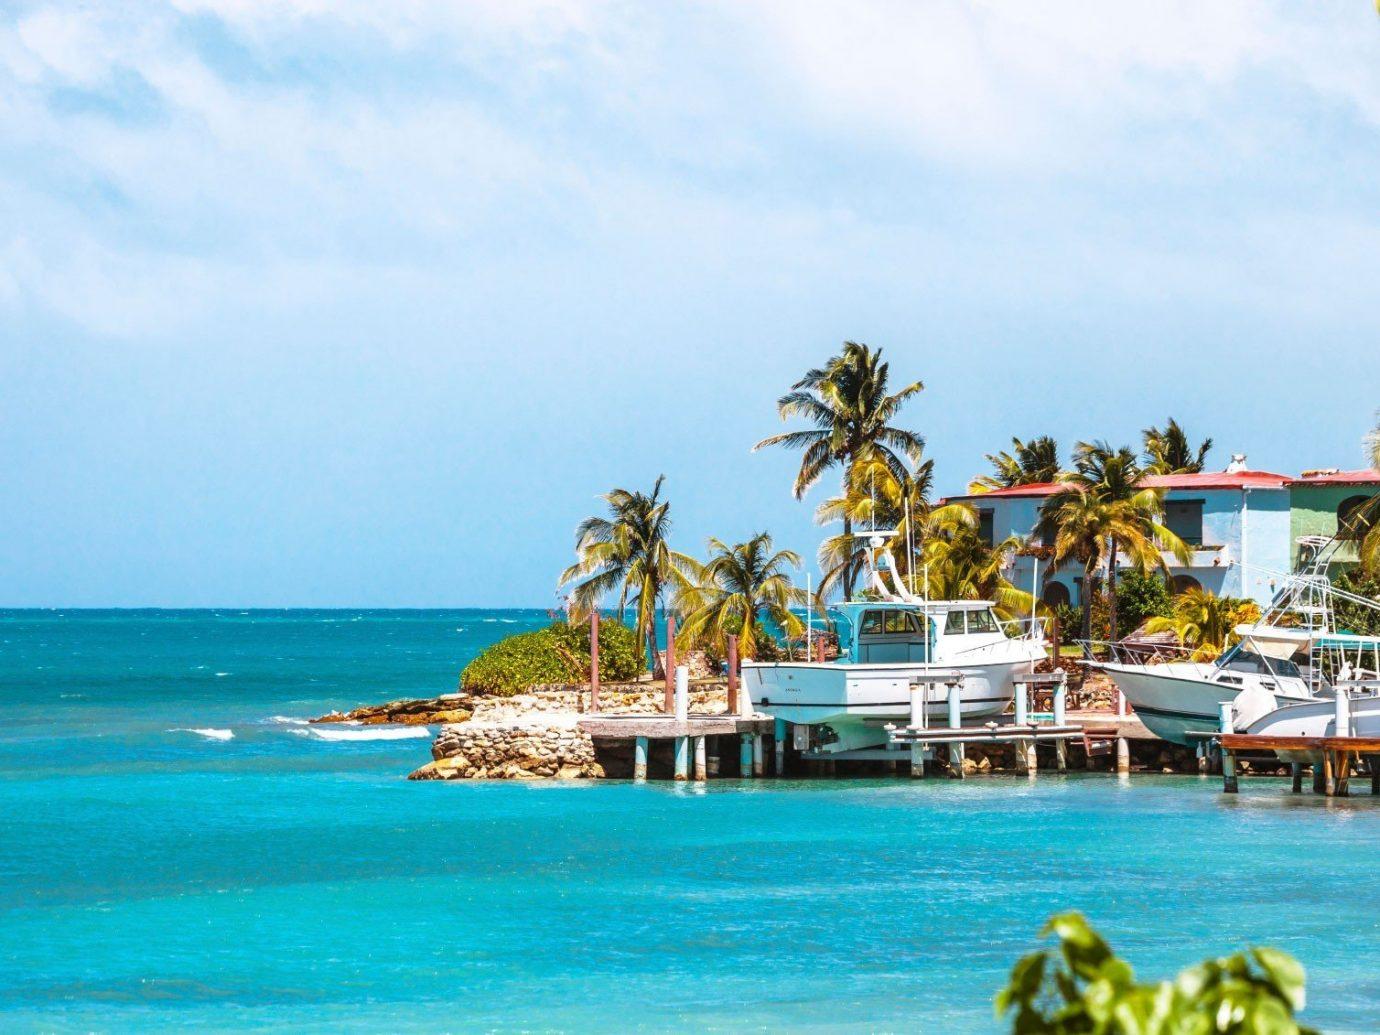 Deals sky water outdoor Beach leisure caribbean Sea vacation Resort Ocean bay Island tropics Lagoon Coast shore swimming